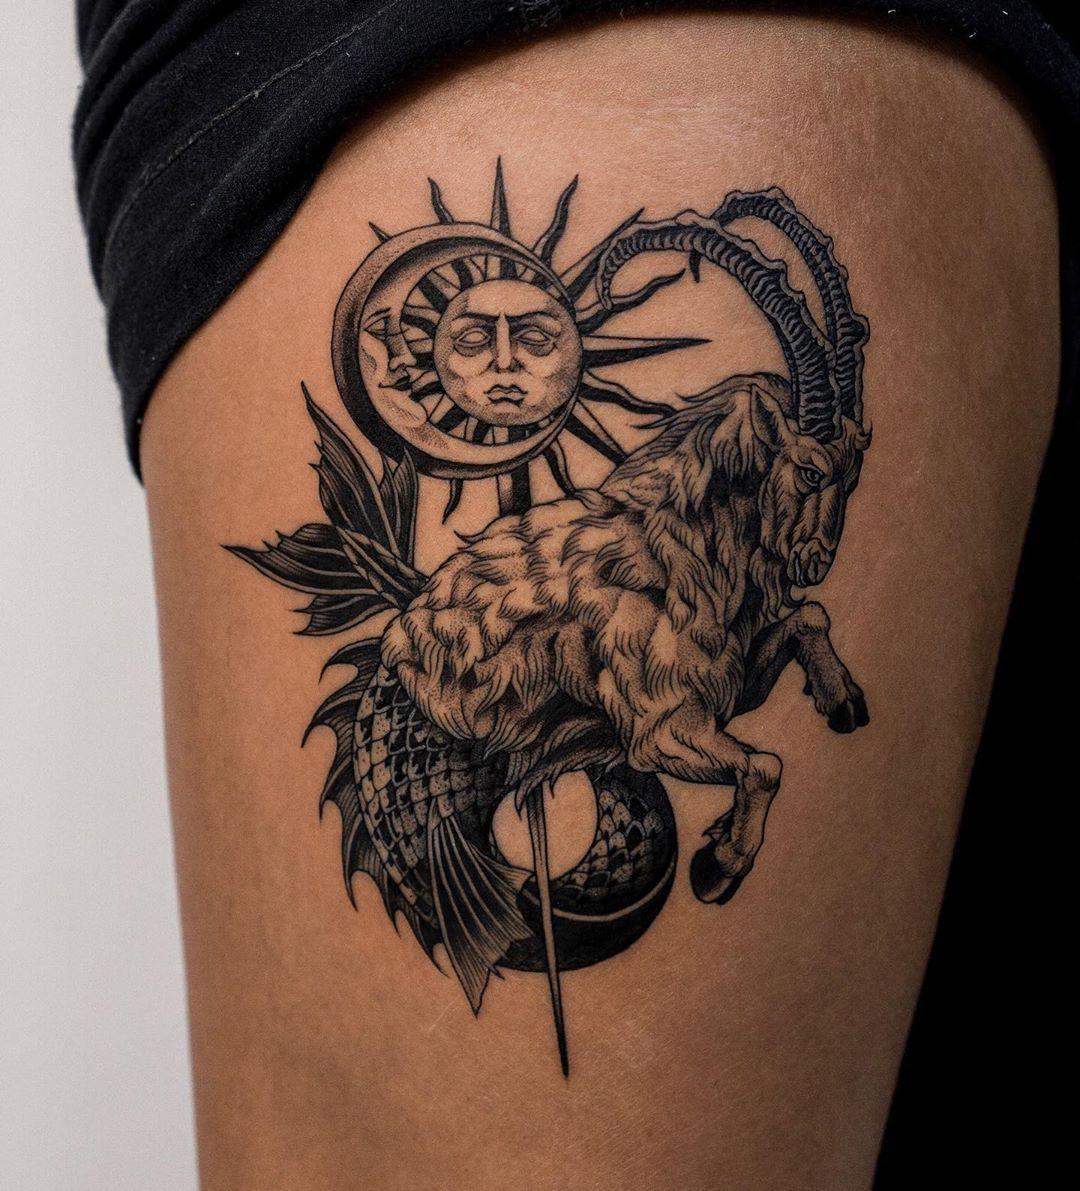 7 Capricorn Tattoo Ideas To Celebrate The Sign S Solar Return Capricorn Tattoo Occult Tattoo Tattoos